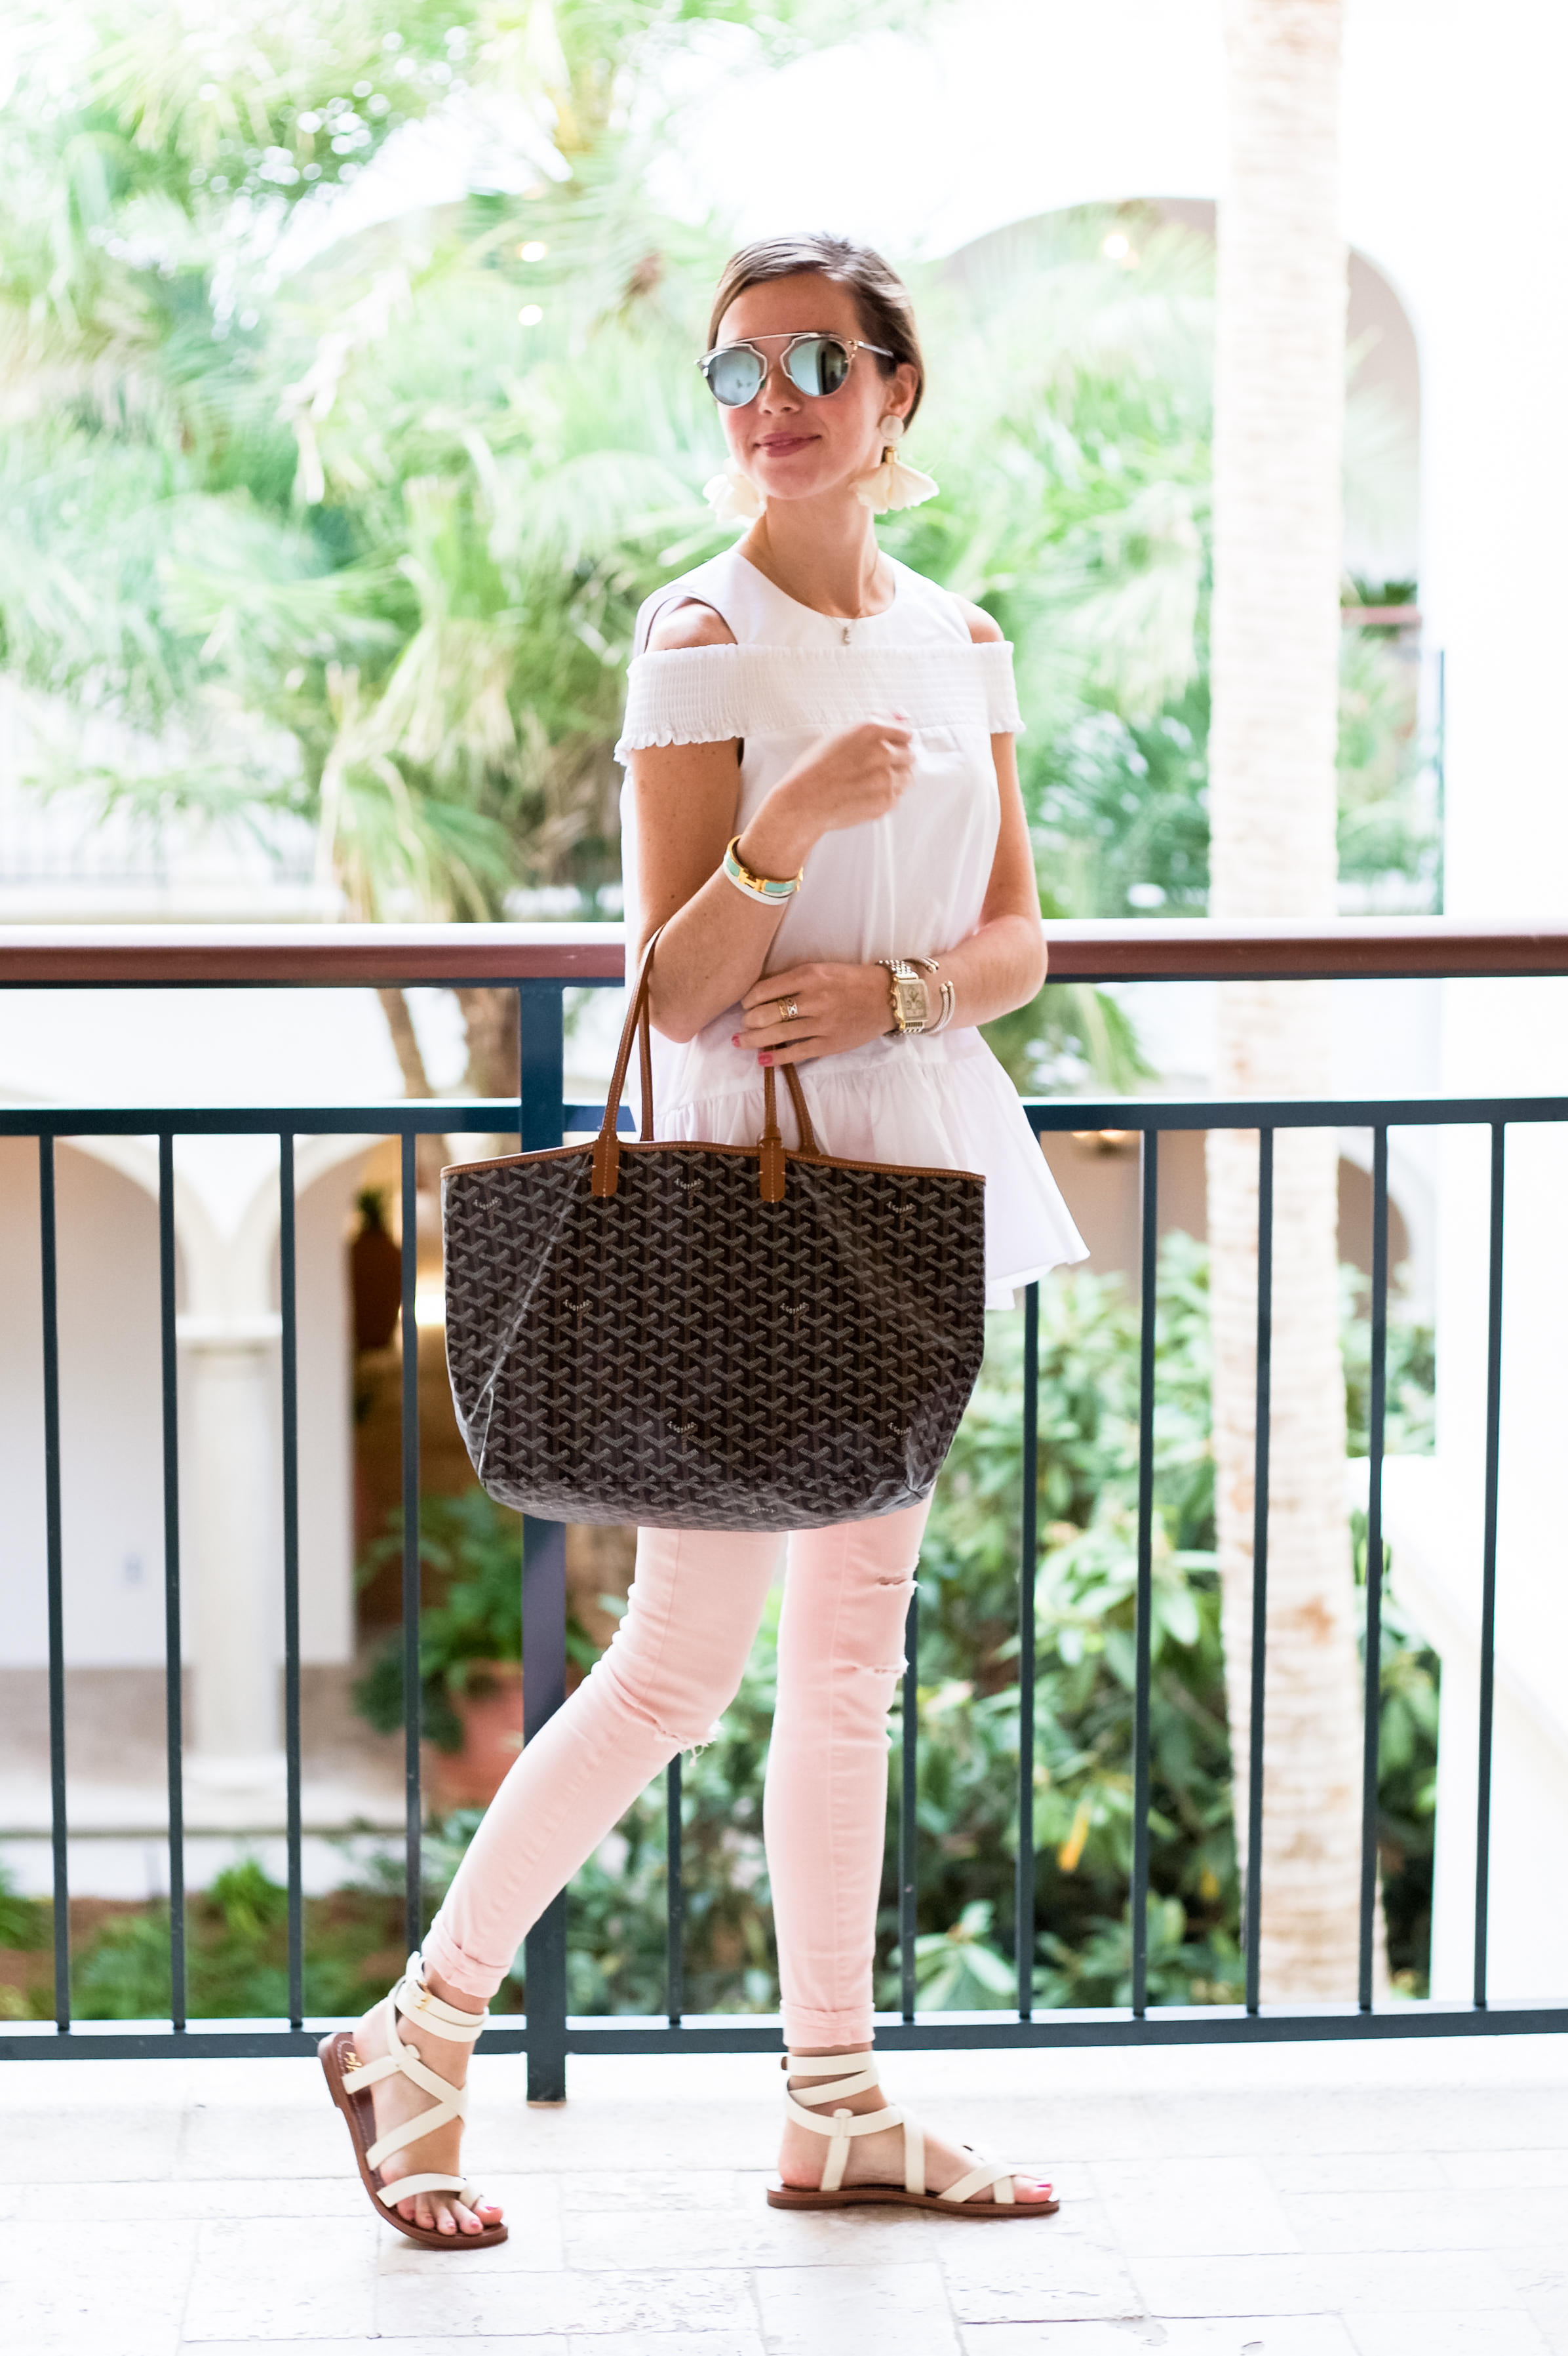 lcb style fashion blogger sea island tscsummit tibi tory burch (16 of 19).jpg